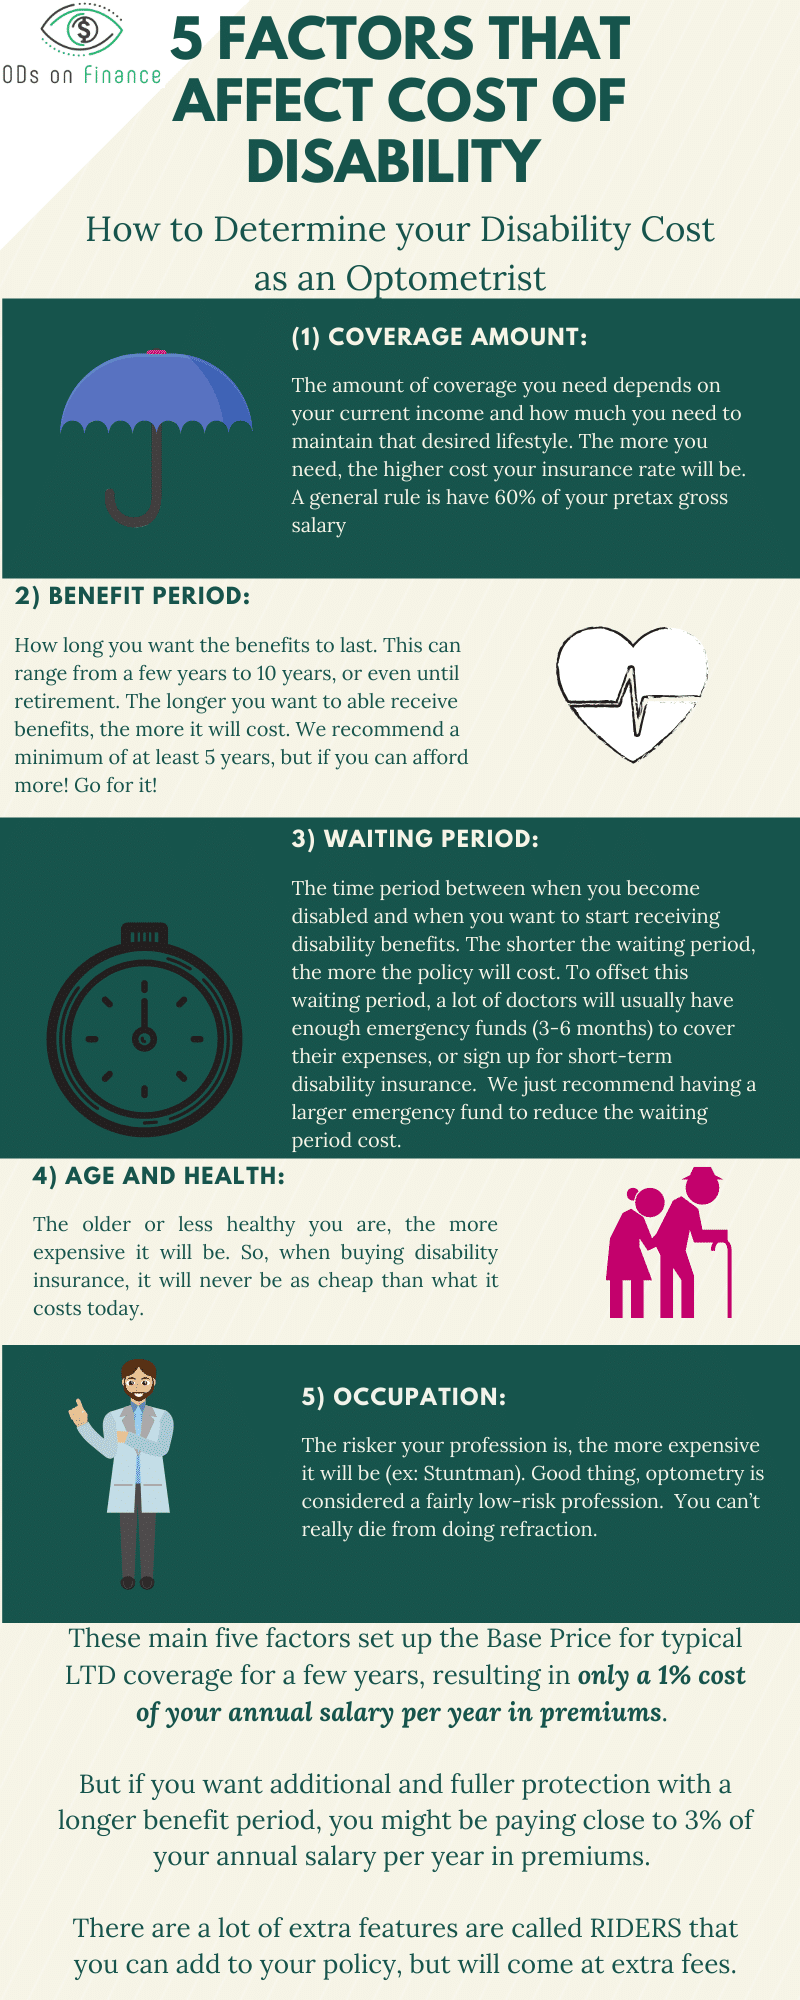 5 factors that affect cost